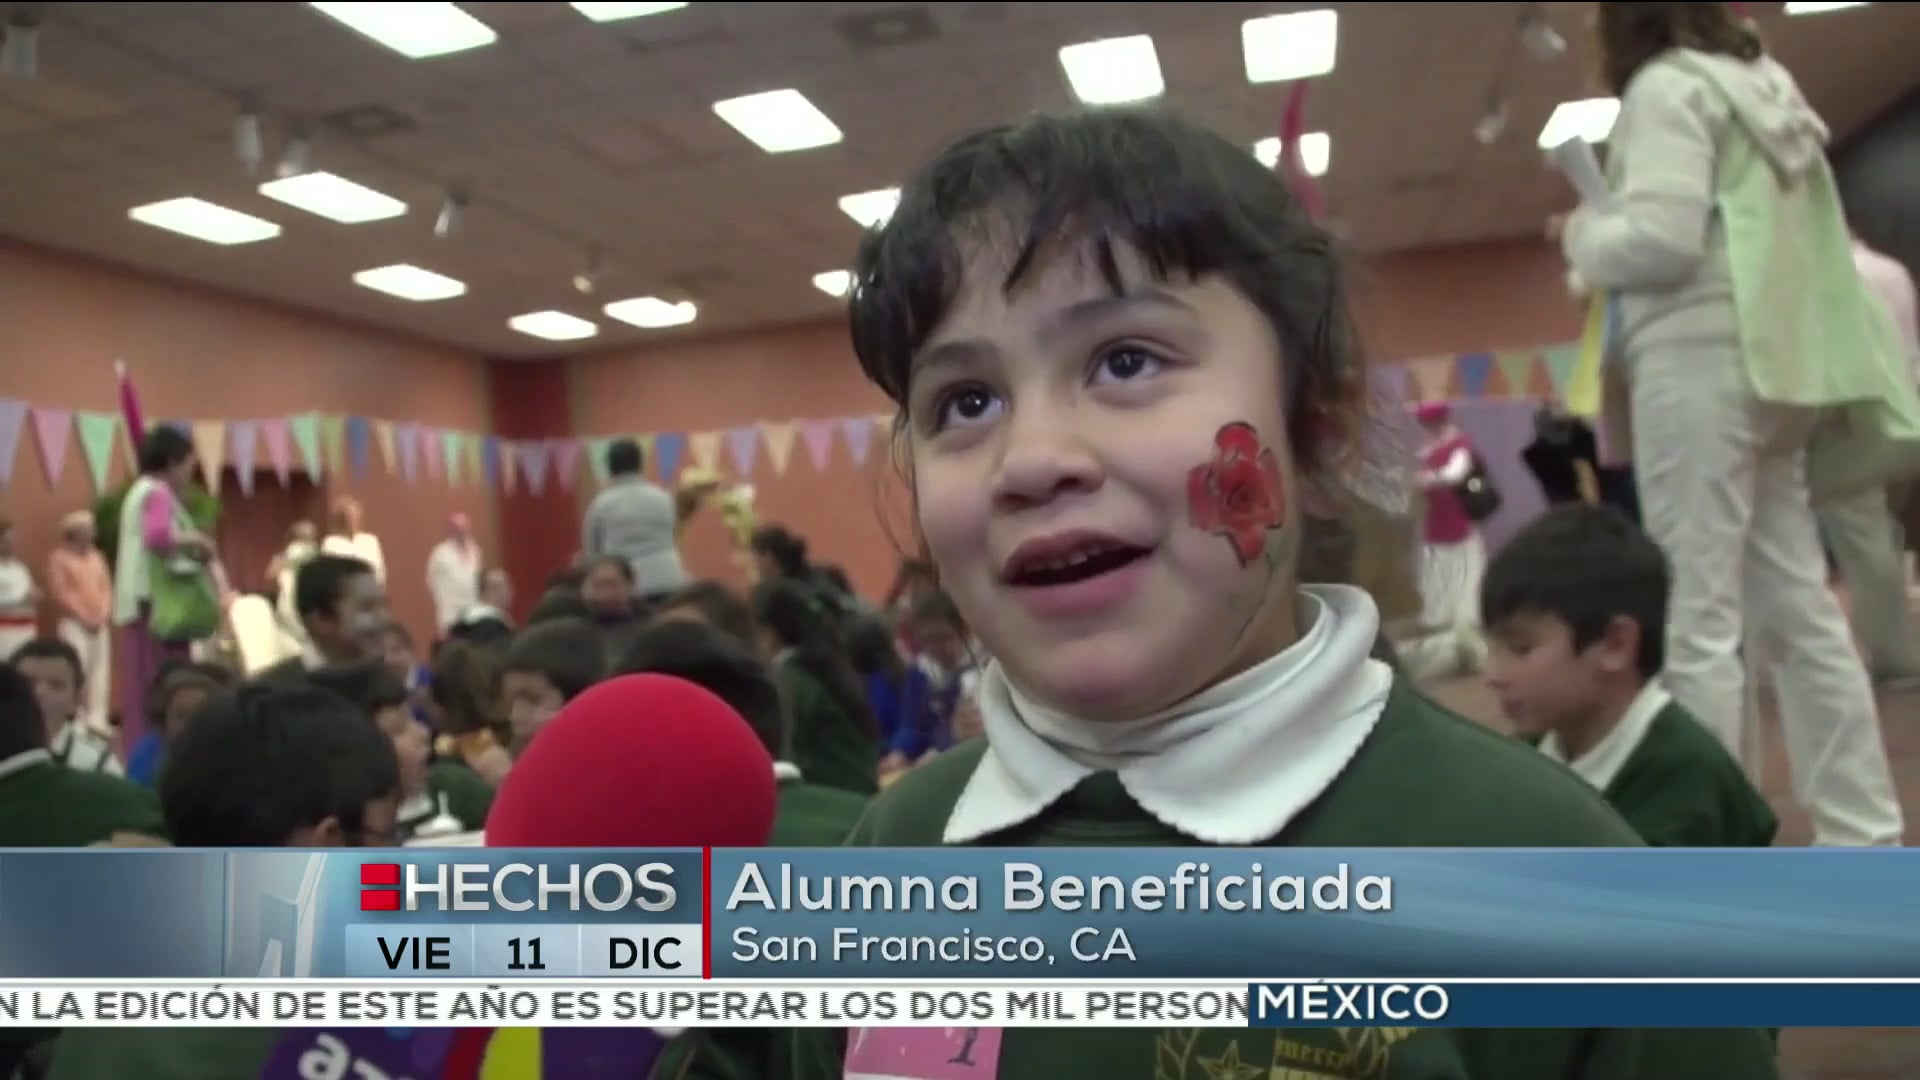 Azteca News Report Francis in the Schools S.F.  Dec 3, 2015